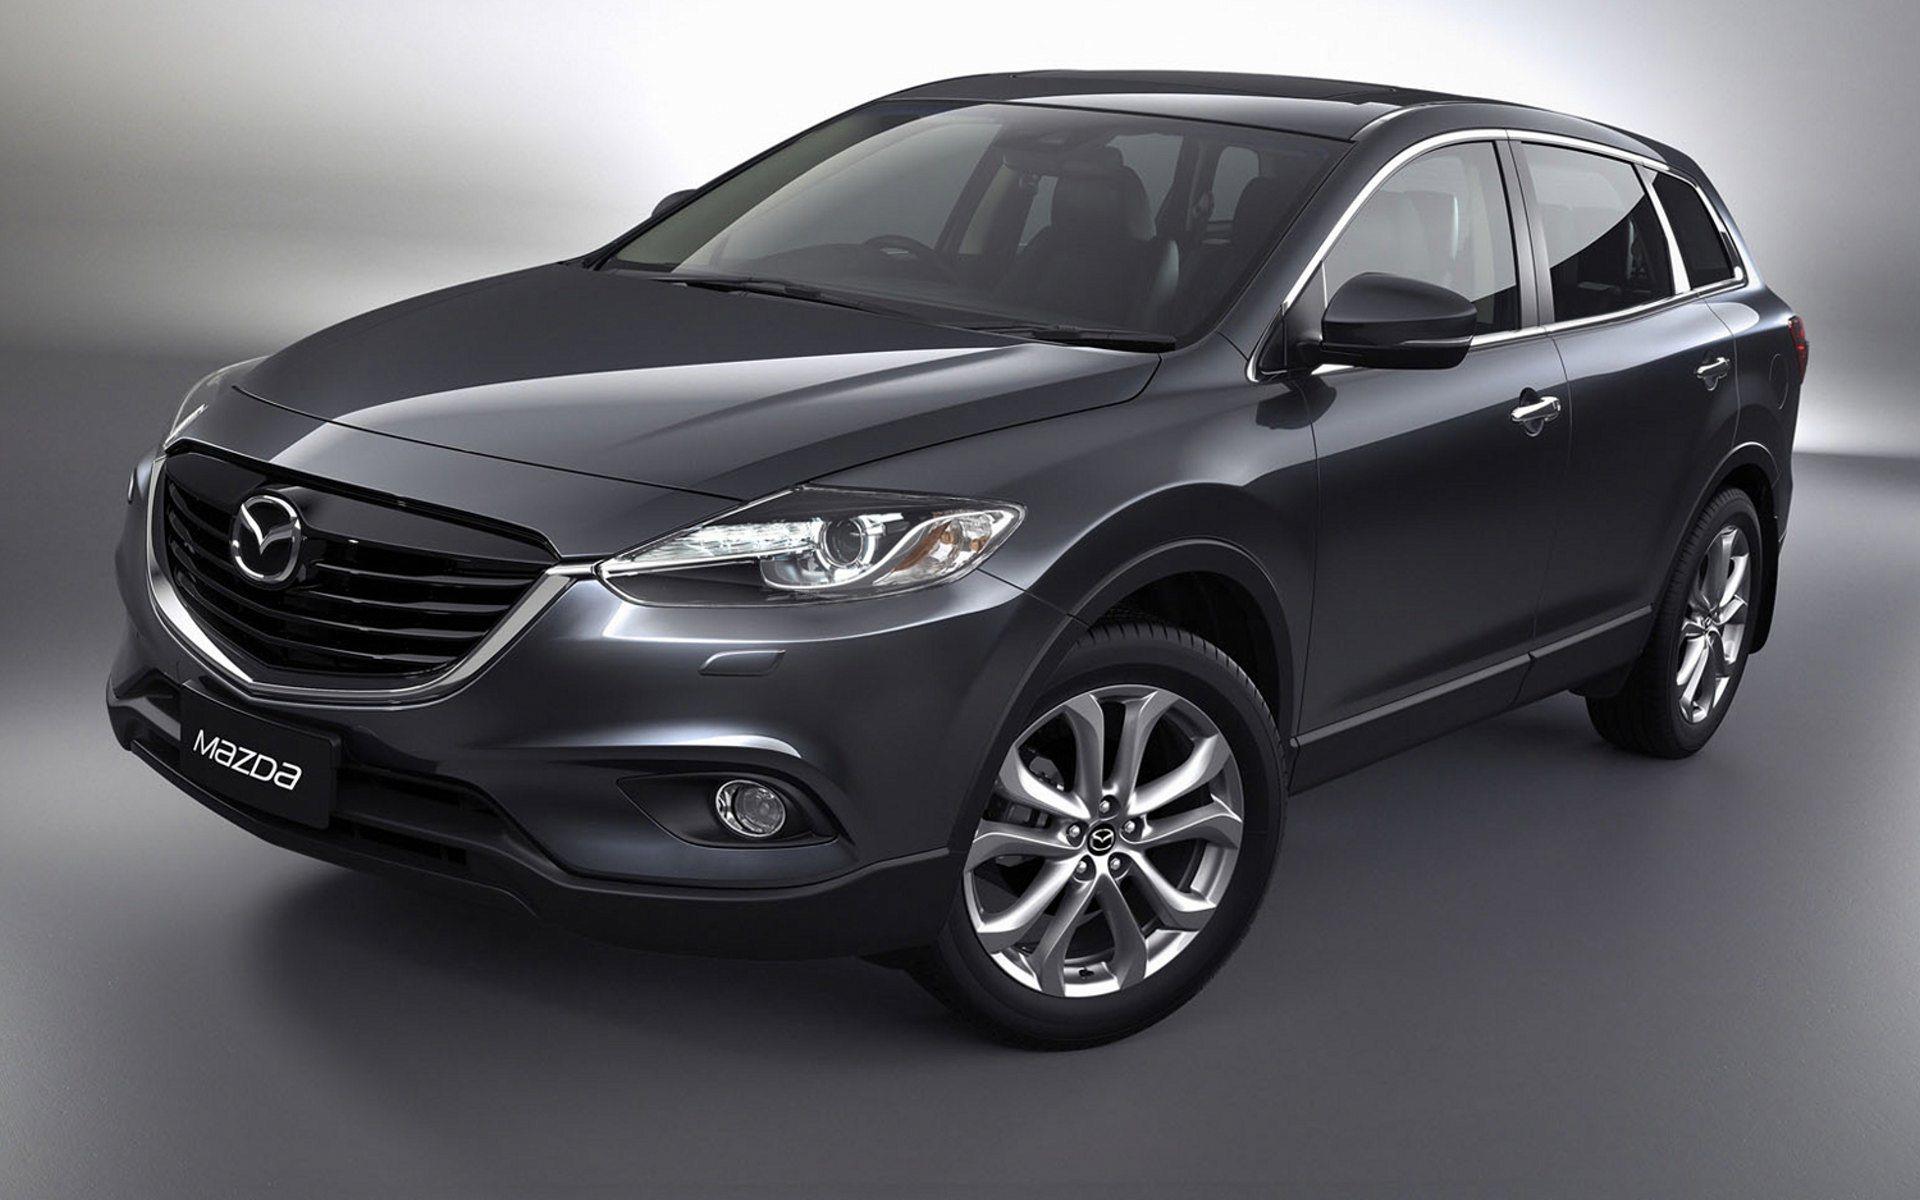 http://4.bp.blogspot.com/-hiweLmWCk88/UU66Vbi2A2I/AAAAAAAASuc/3MGFFIxfKlg/s1920/2013-Mazda-CX-9-wallpaper-3.jpg